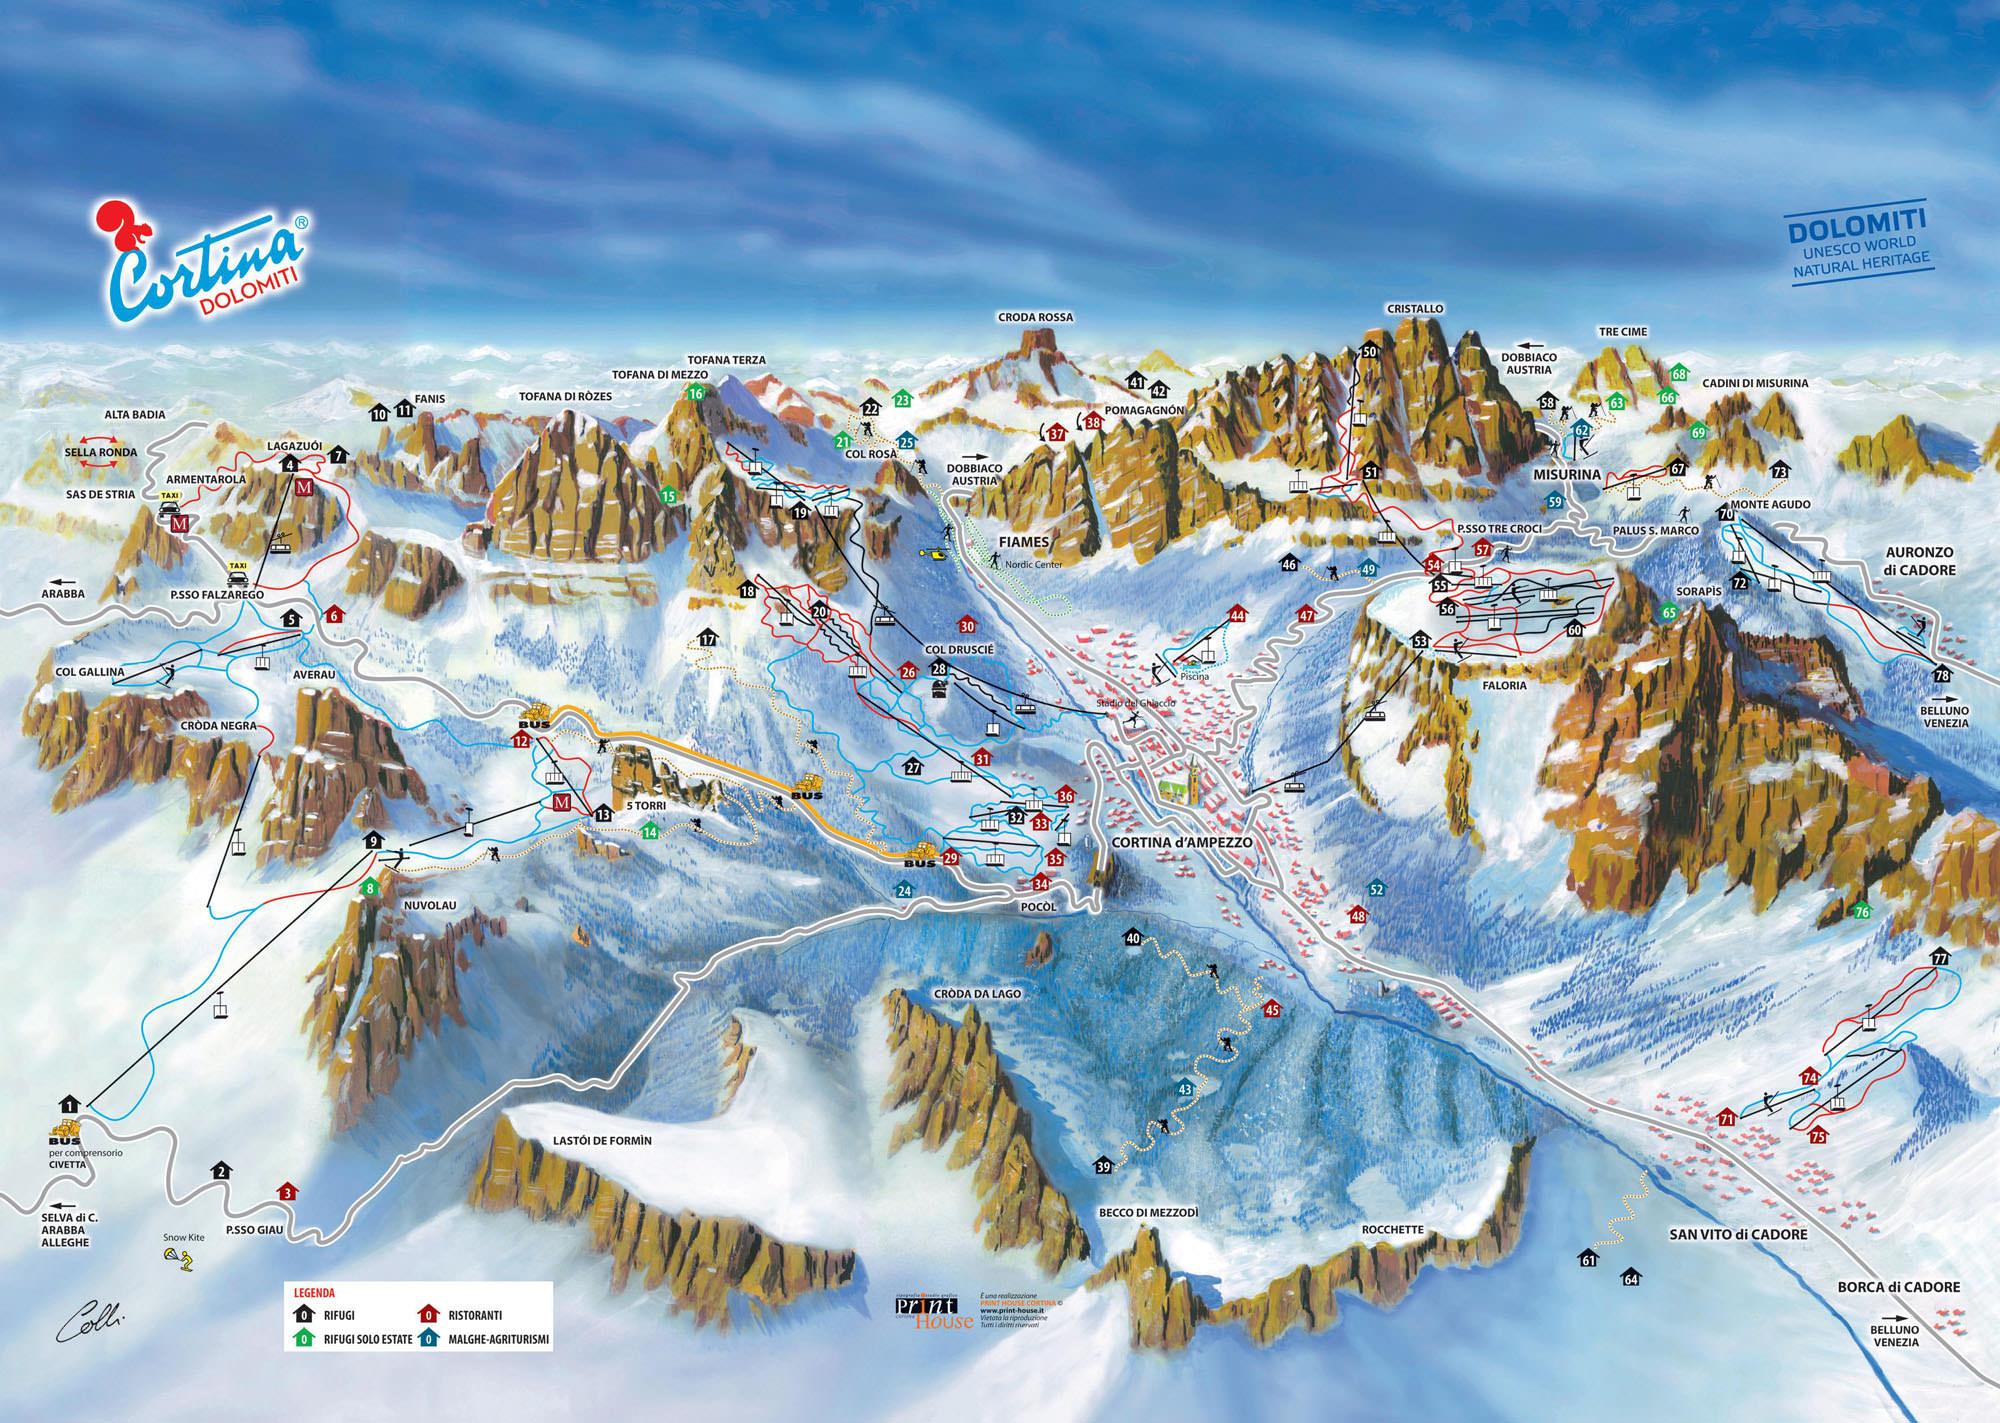 Pistenplan - Cortina dAmpezzo